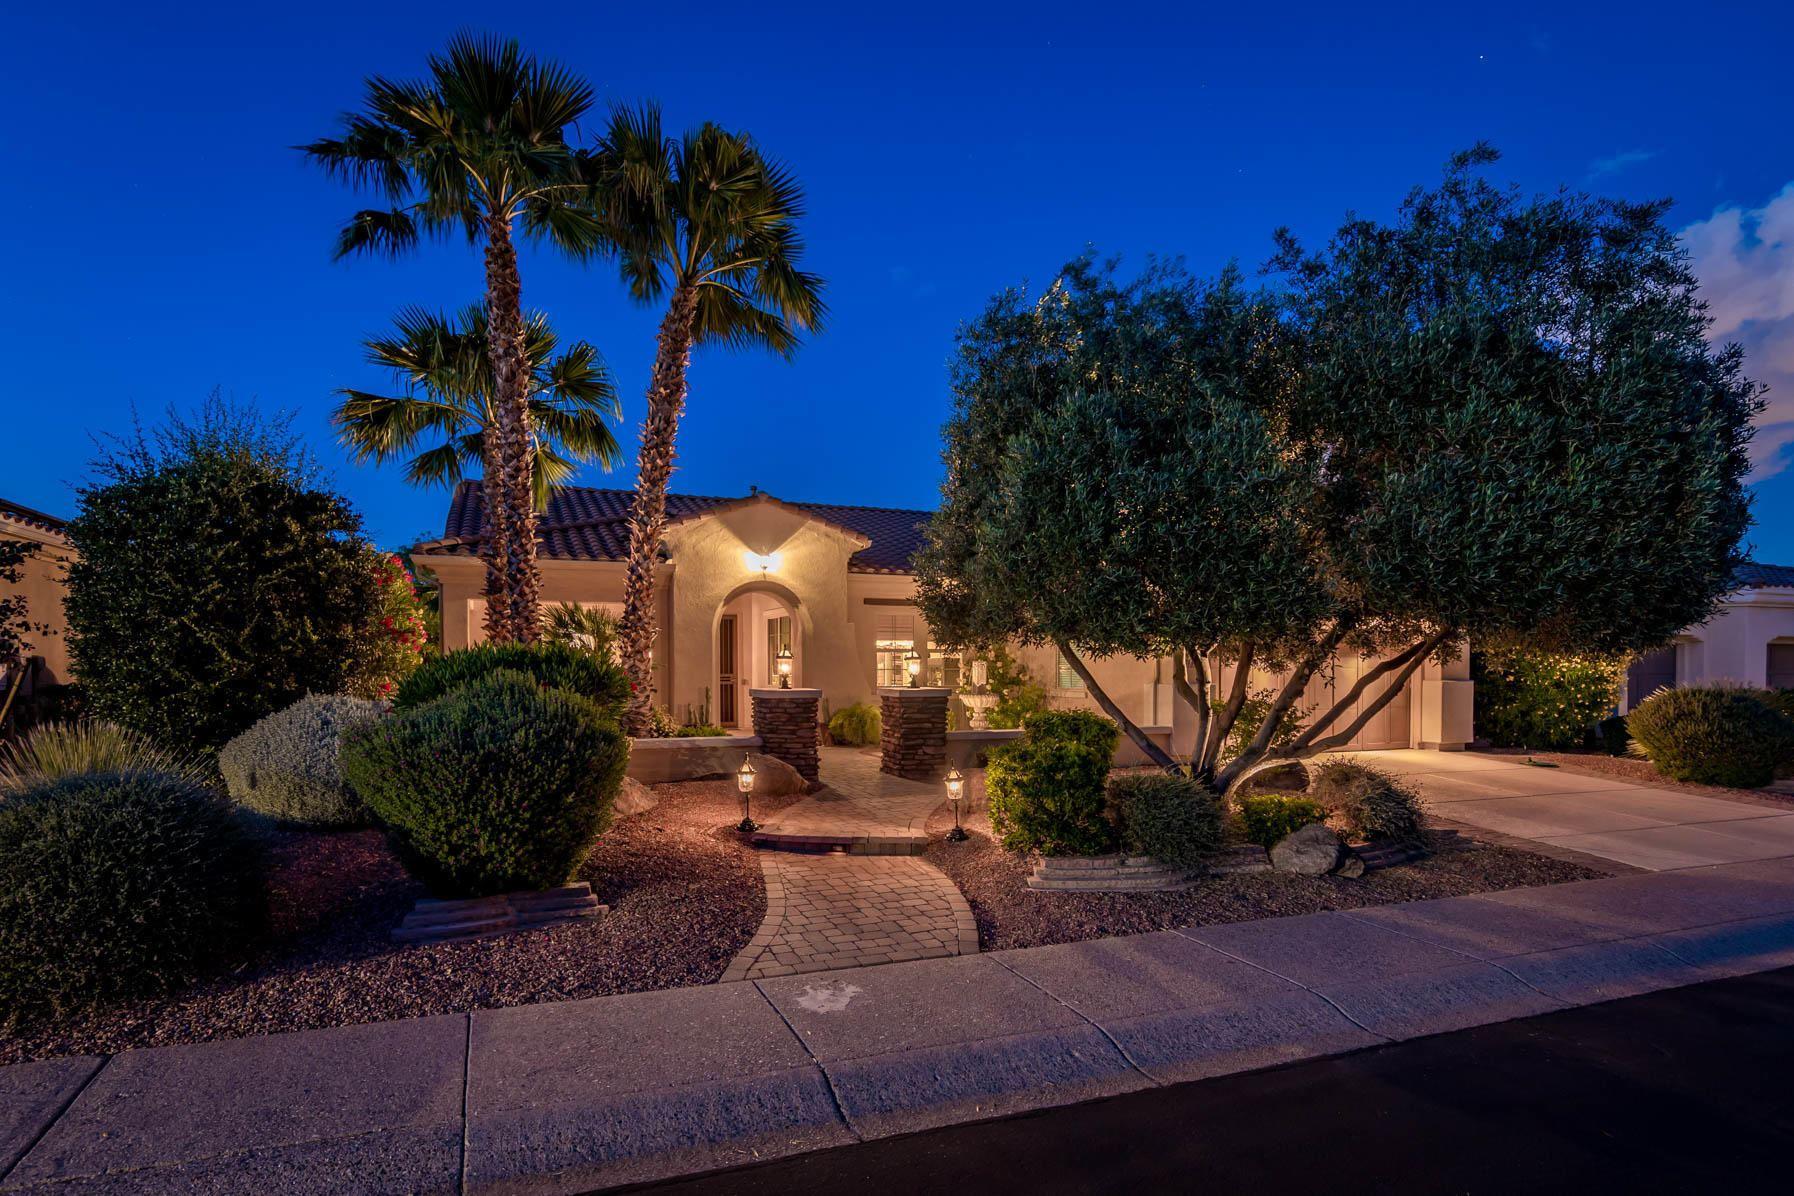 Photo of 13274 W MICHELTORENA Court, Sun City West, AZ 85375 (MLS # 6229760)